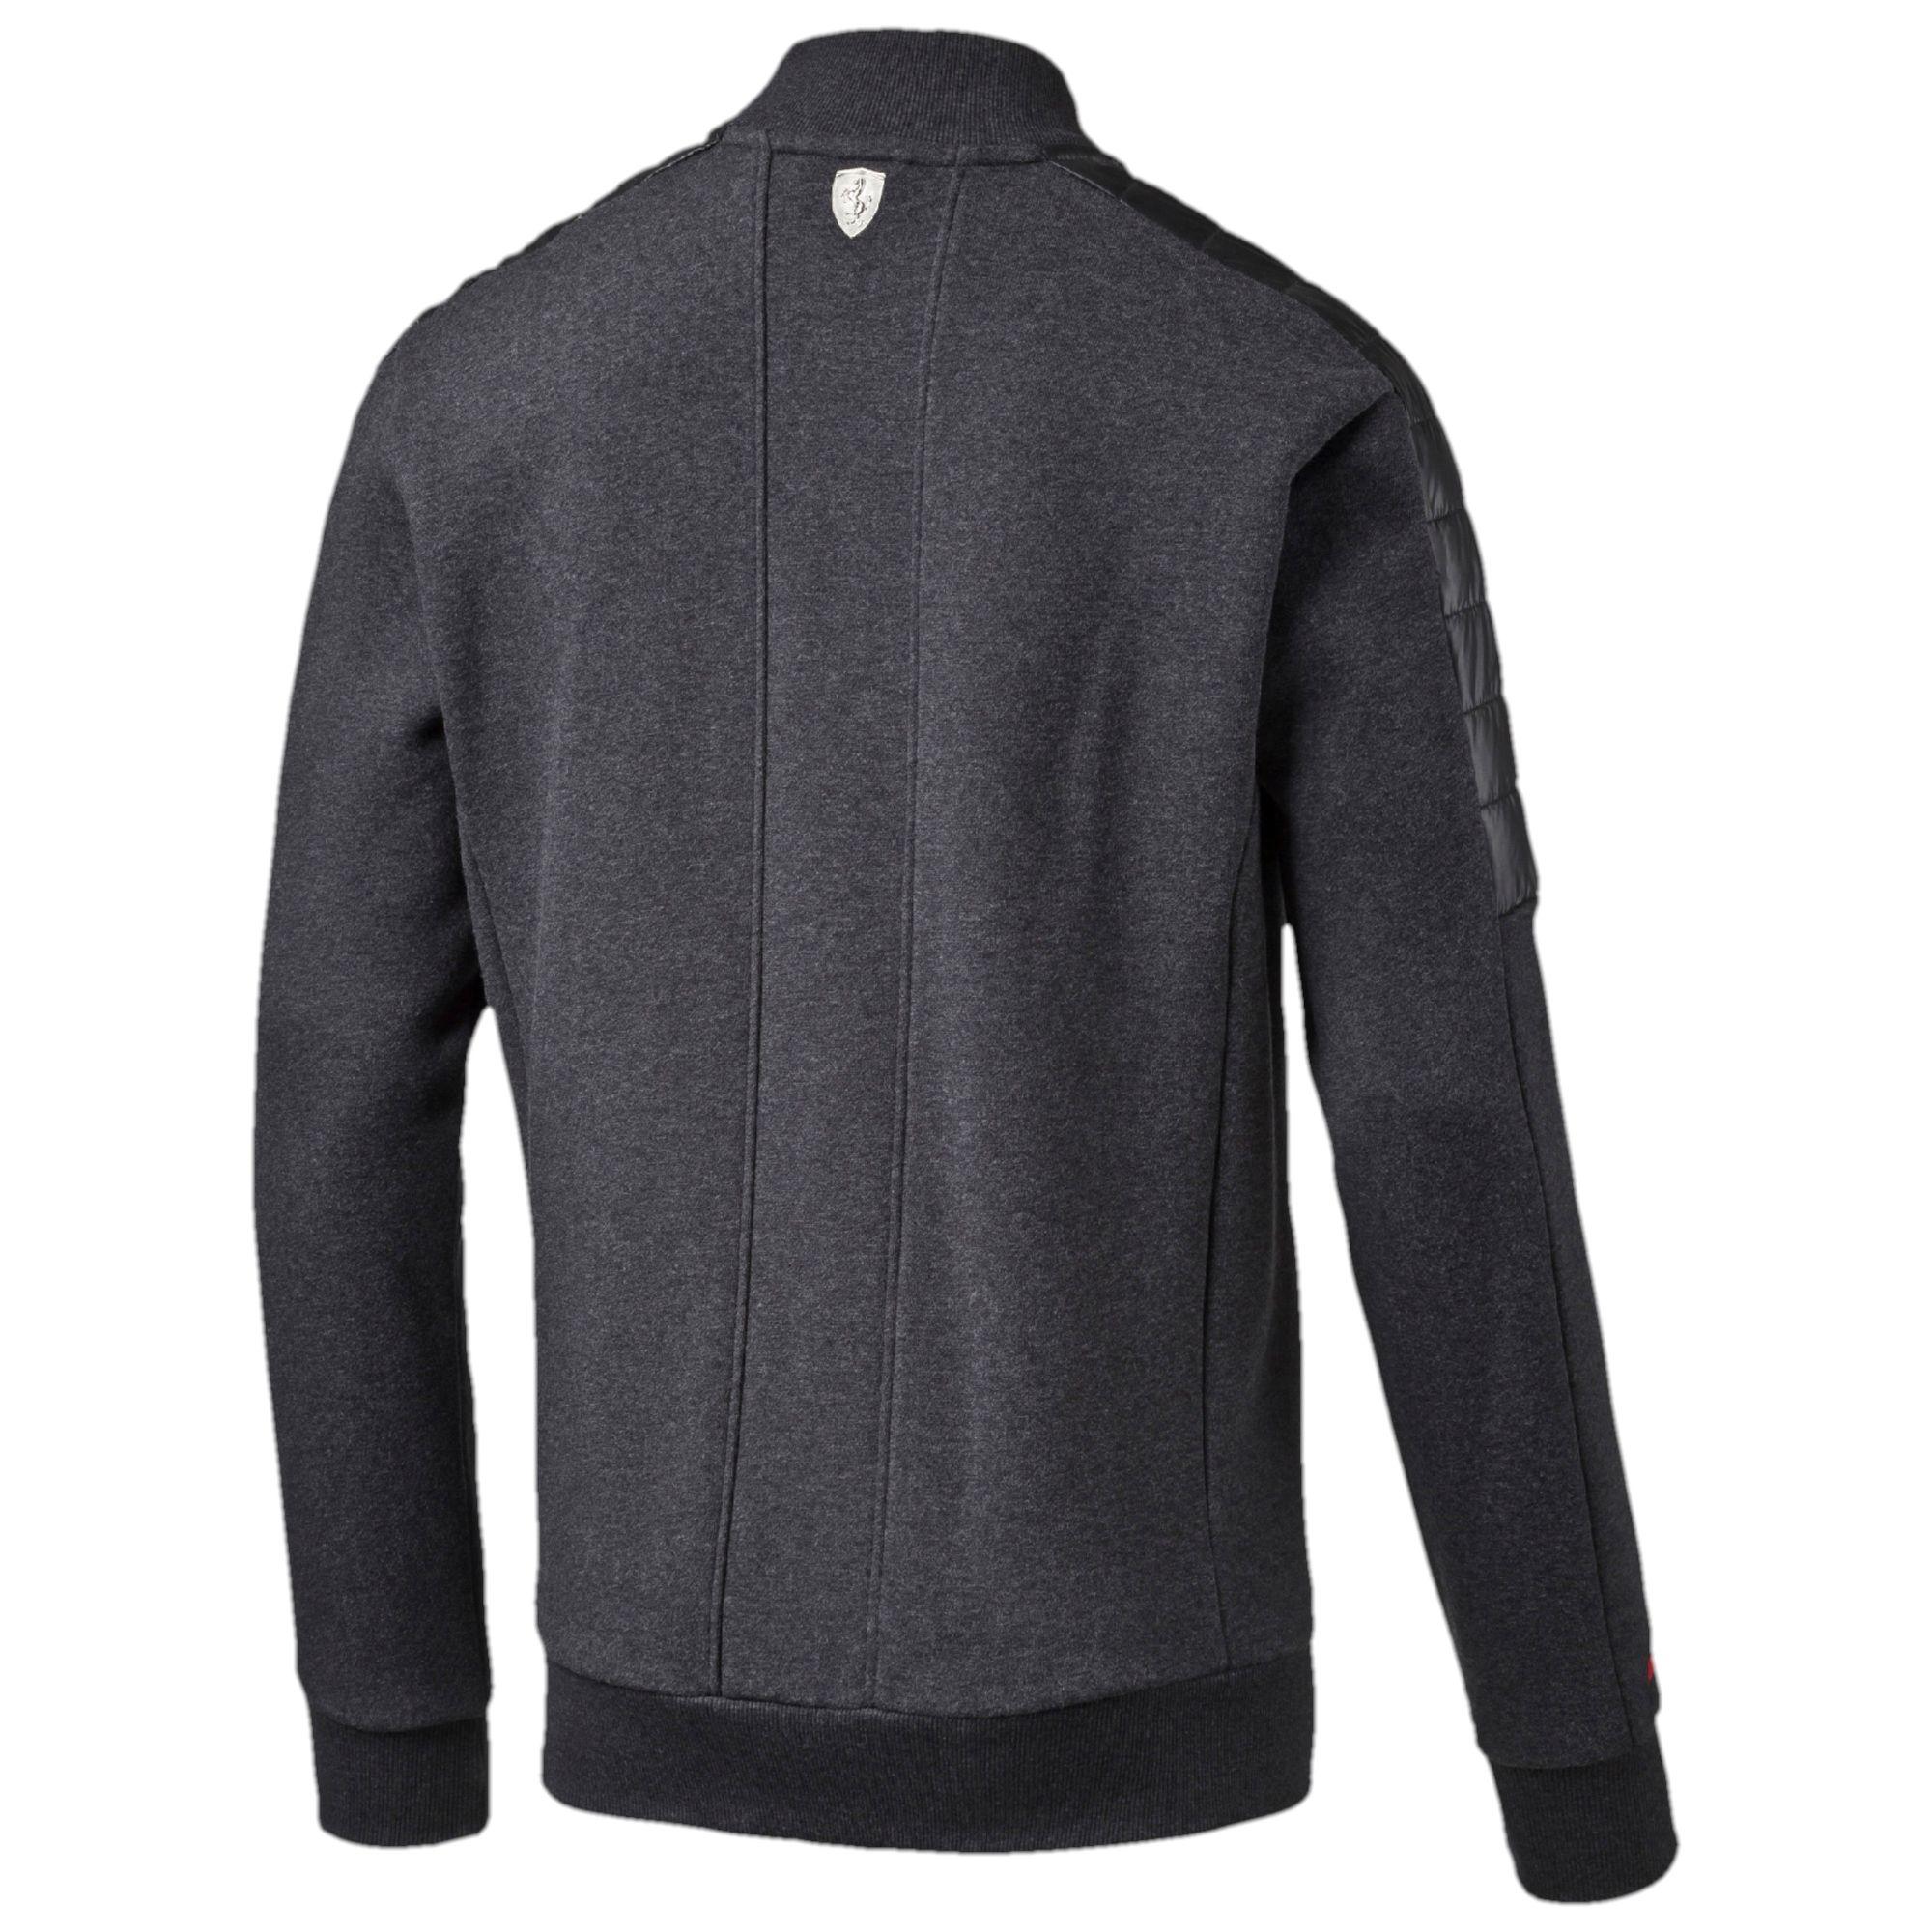 jacket puma price ferrari countings